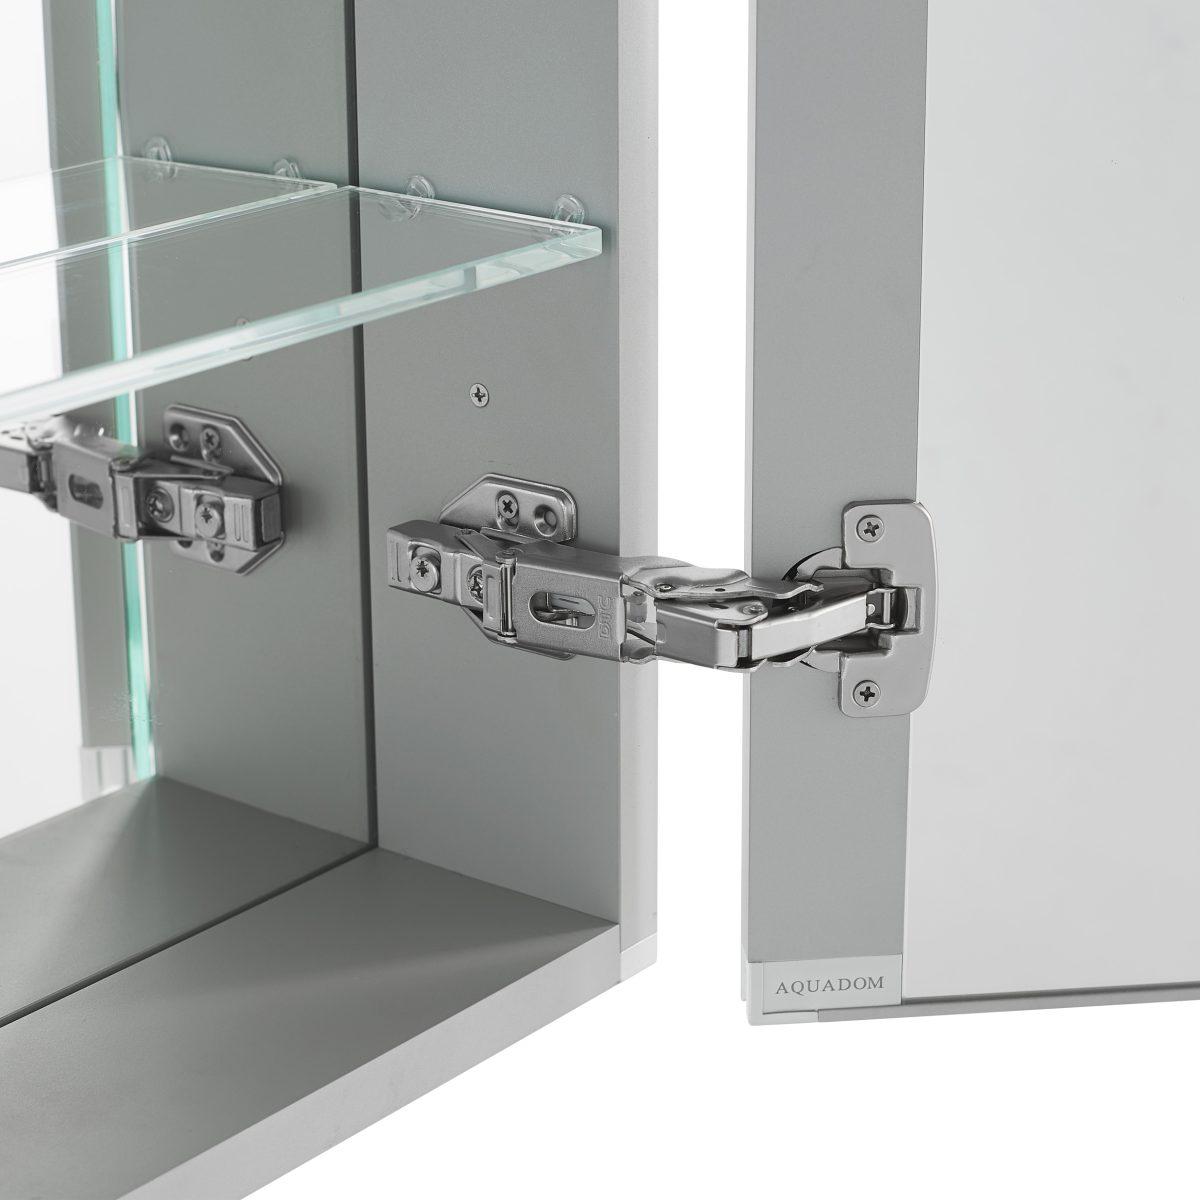 AQUADOM Pacifica 20 inches x 26 inches LED Mirror Glass Medicine Cabinet for Bathroom